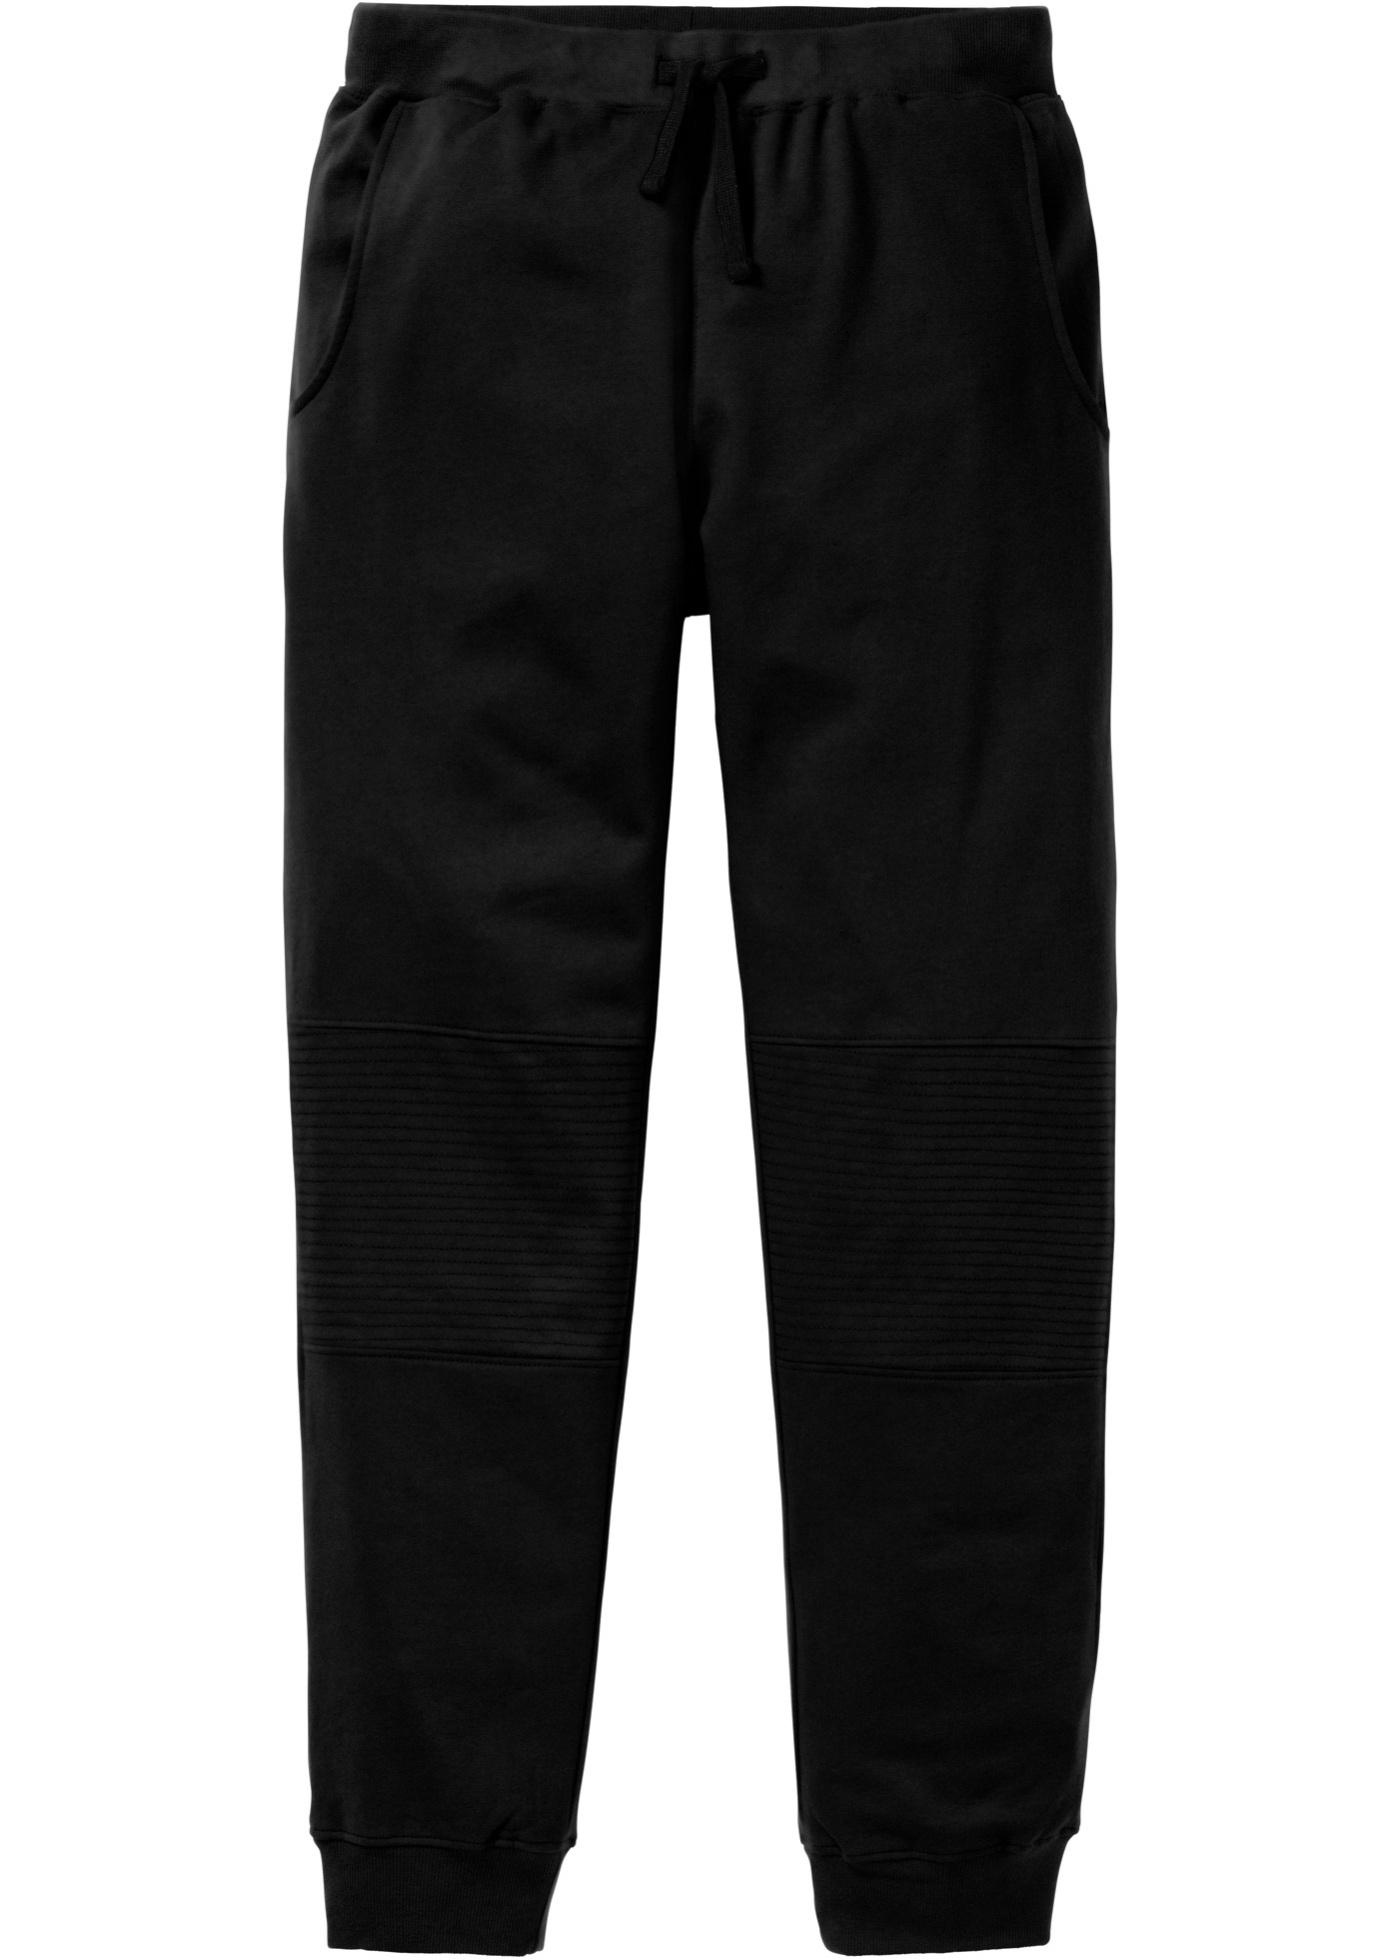 Pantalone da jogging  Ner